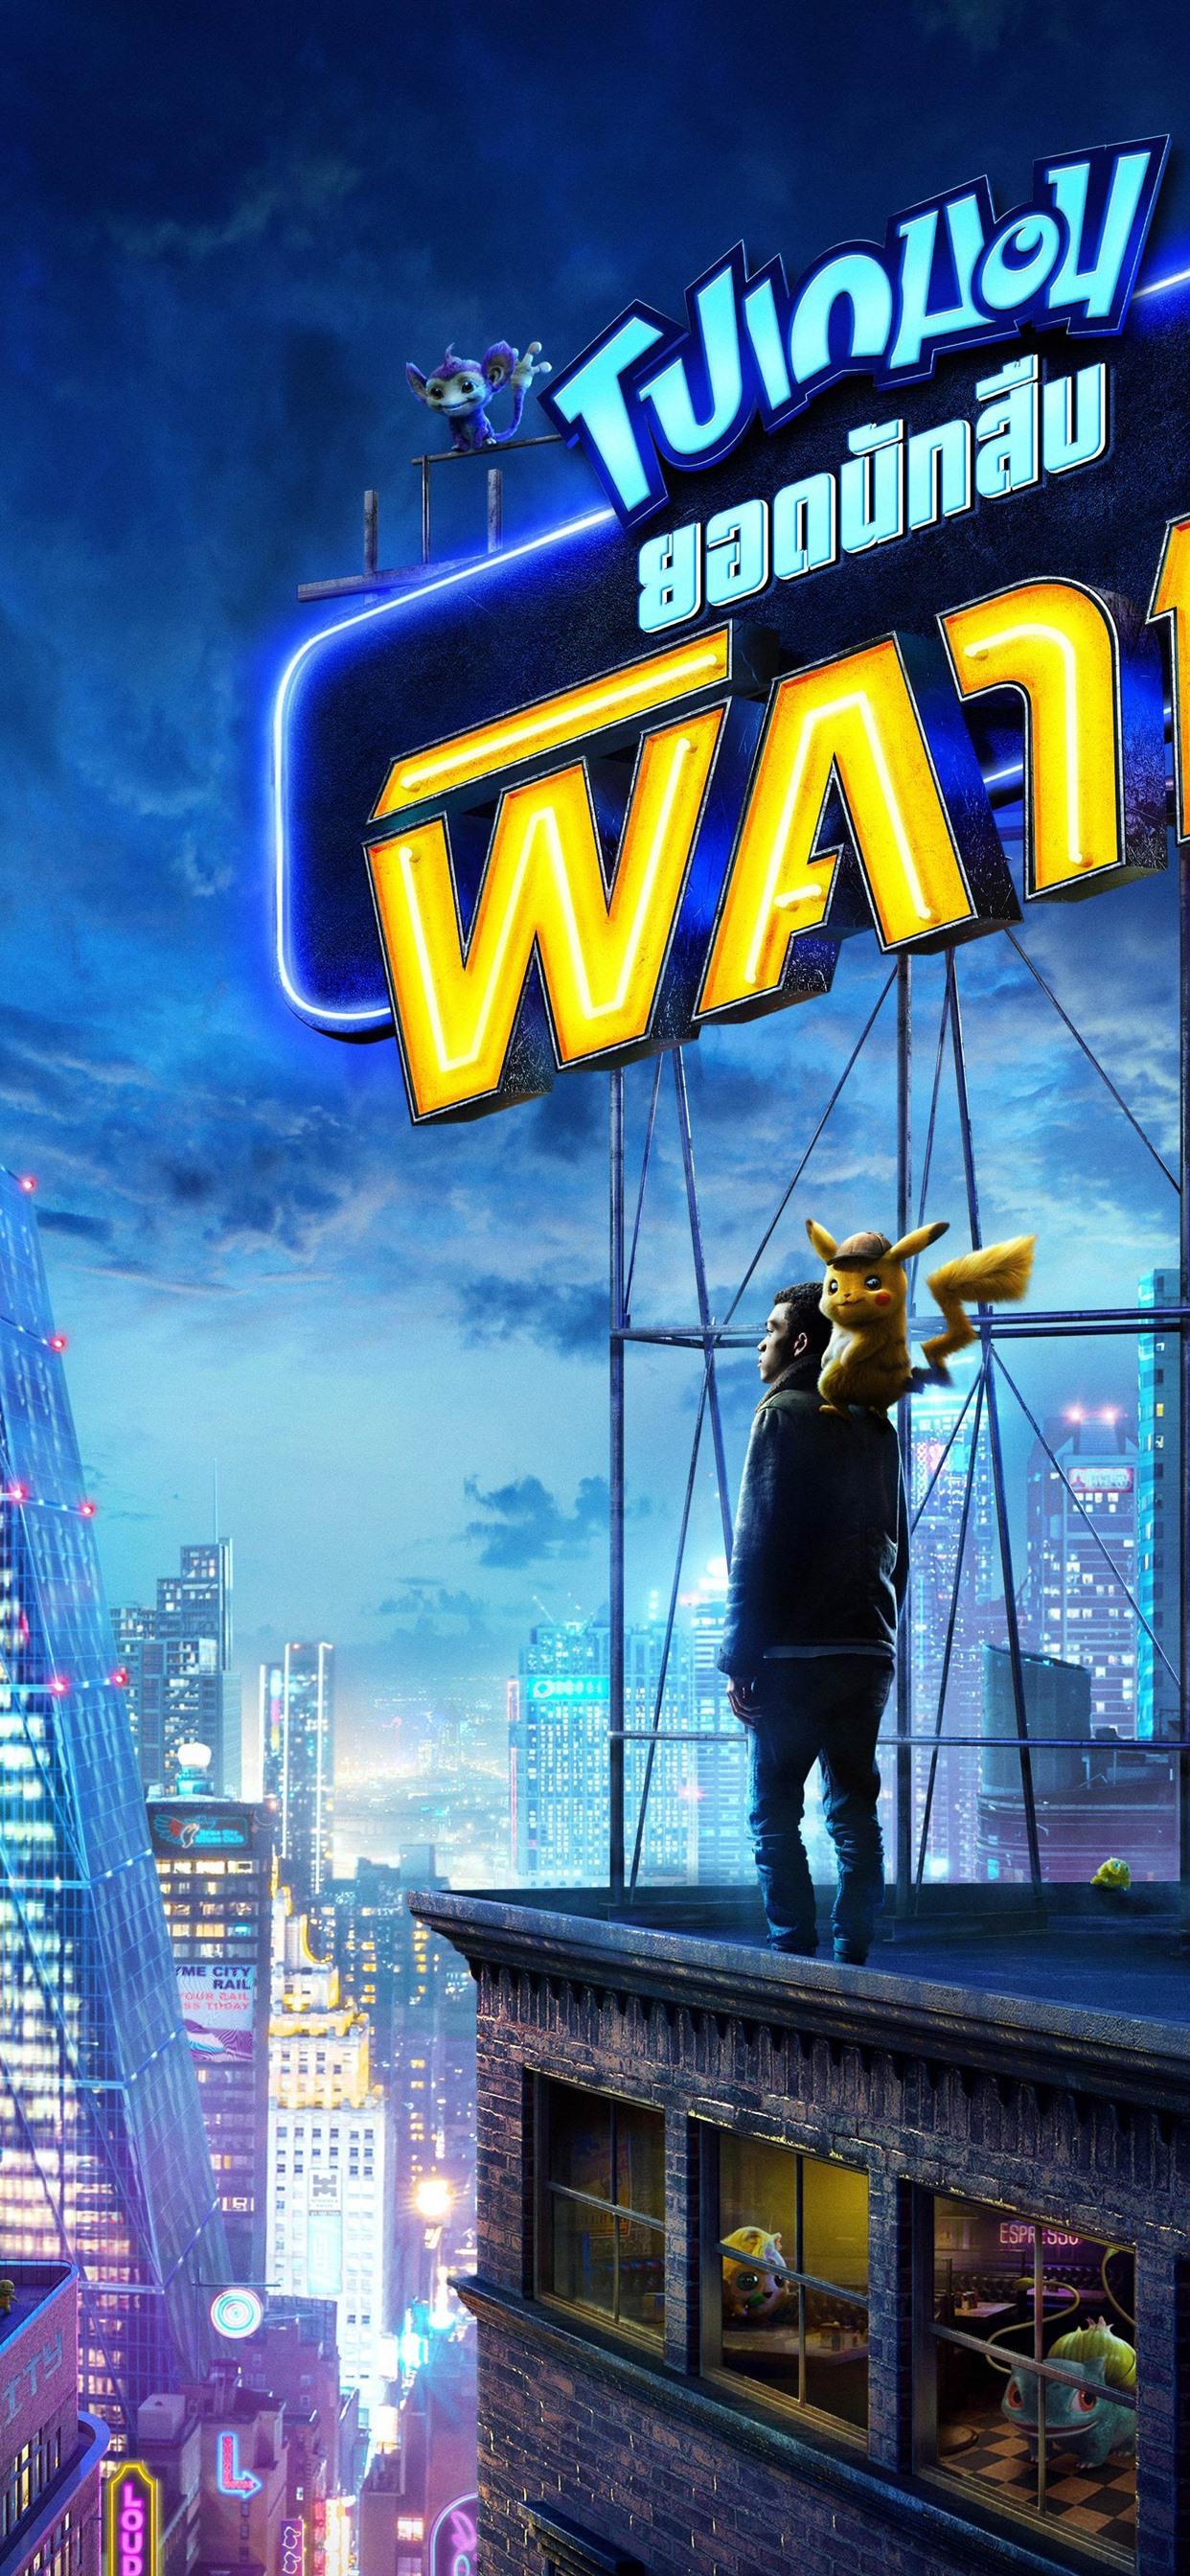 Pokemon Detective Pikachu 1242x2688 Iphone Xs Max Wallpaper